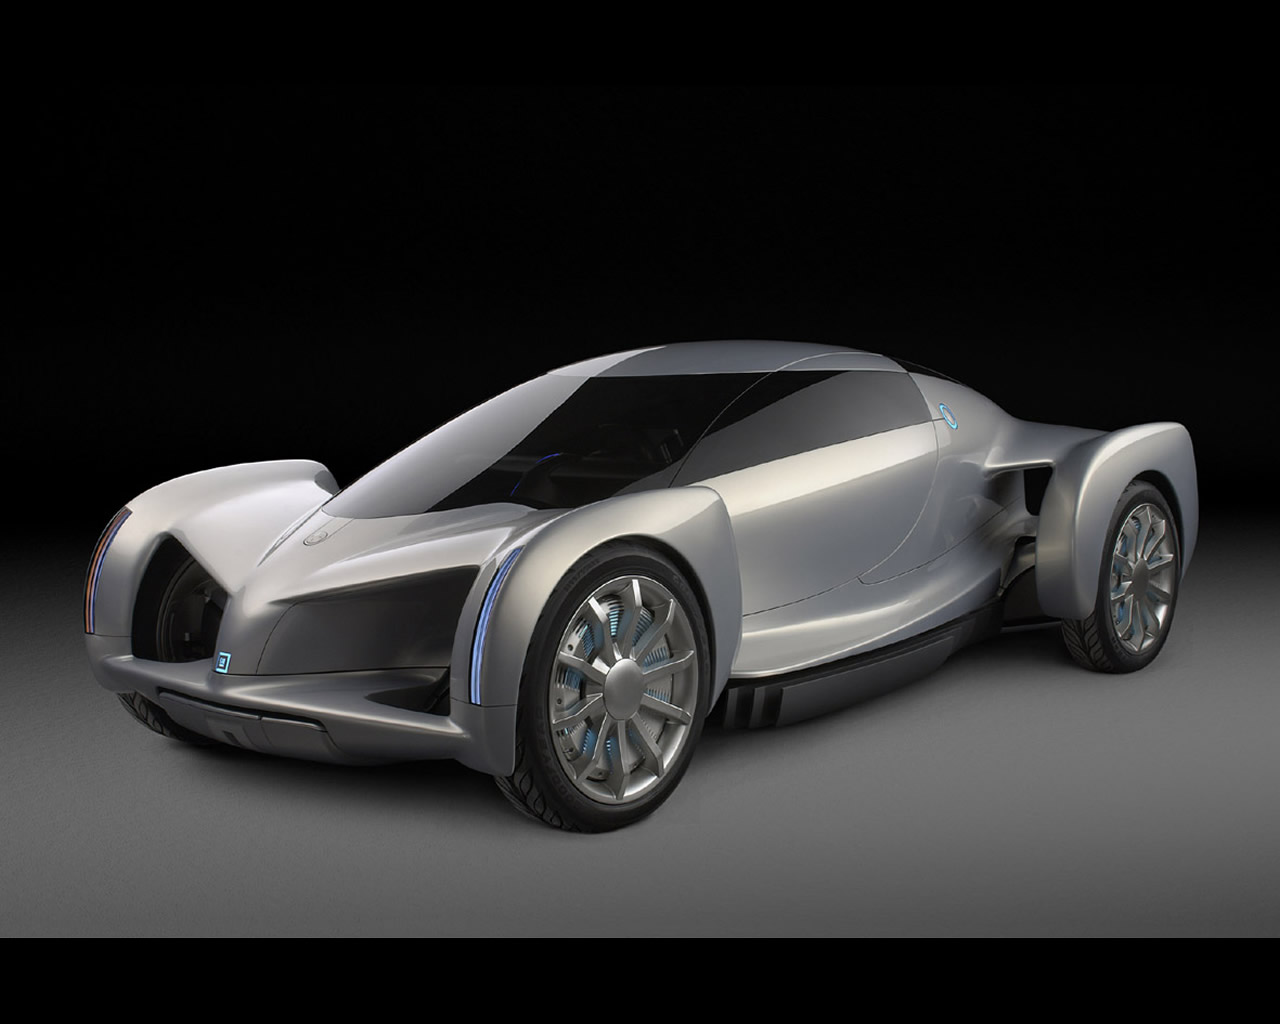 General Motors Autonomy Concept 2002